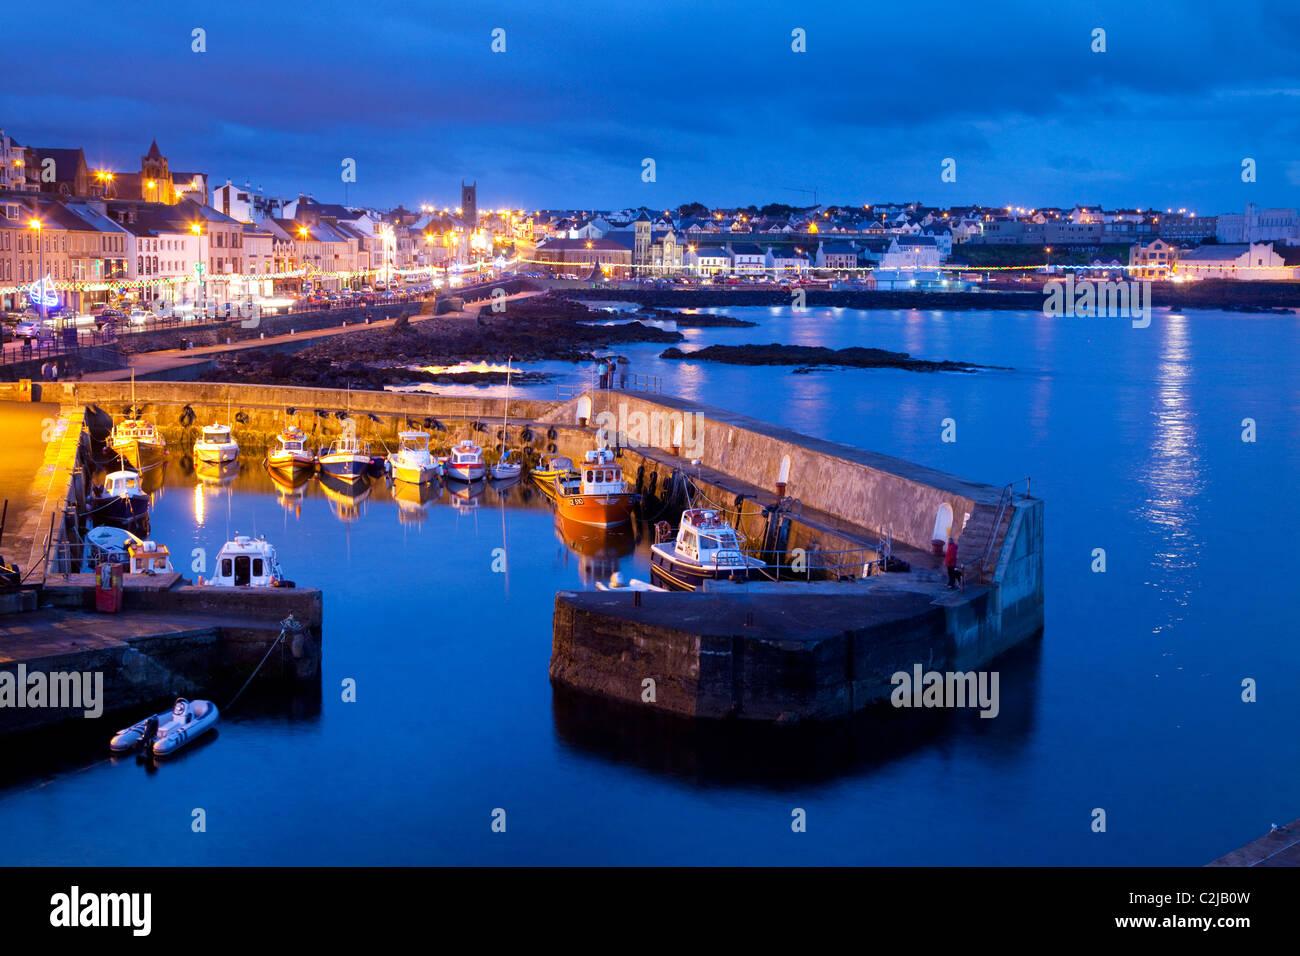 Portstewart at dusk, Co Derry, Northern Ireland. - Stock Image